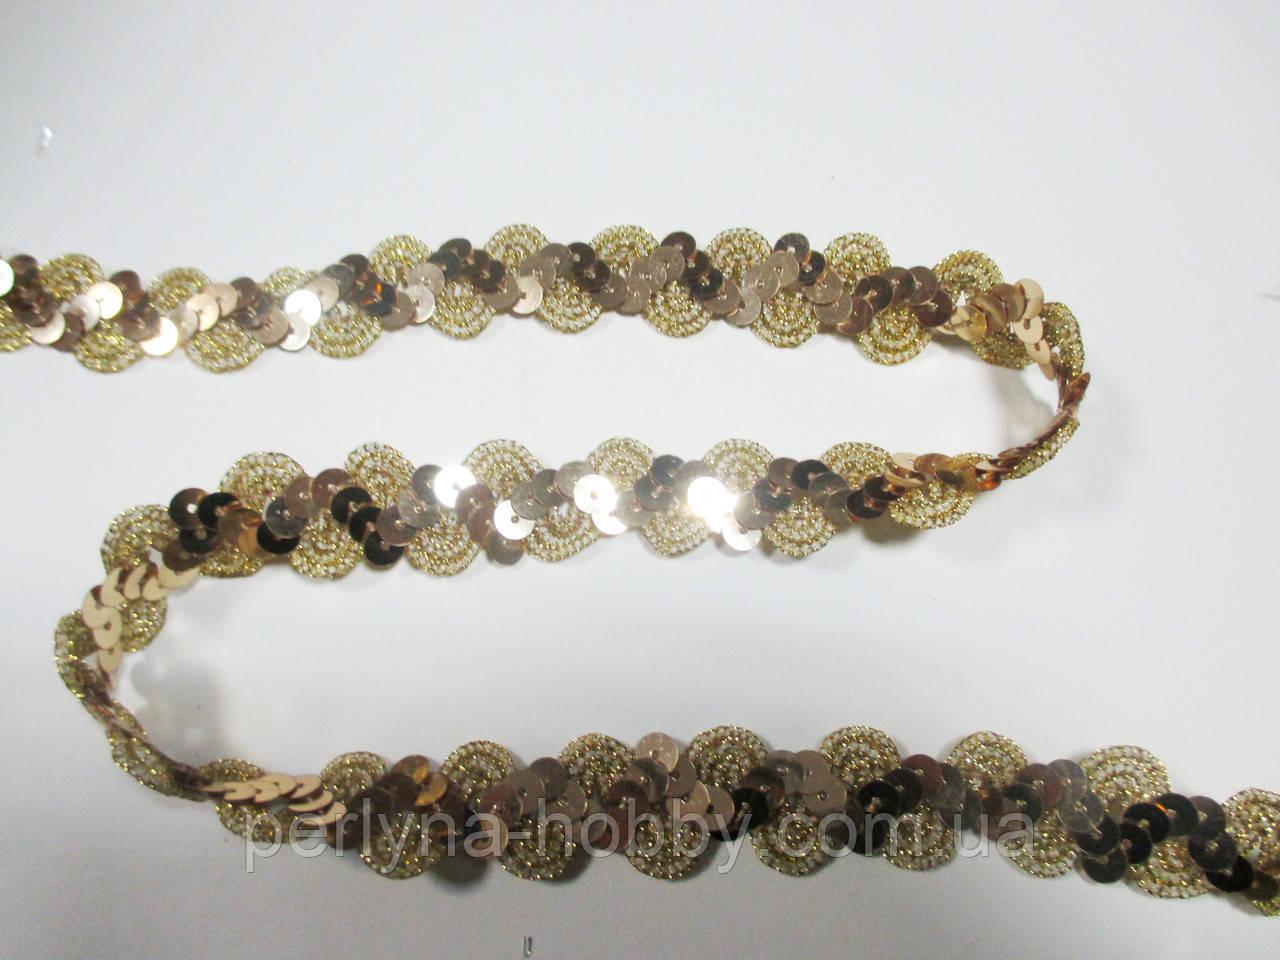 Тасьма з паєтками золото см 1,5 см.